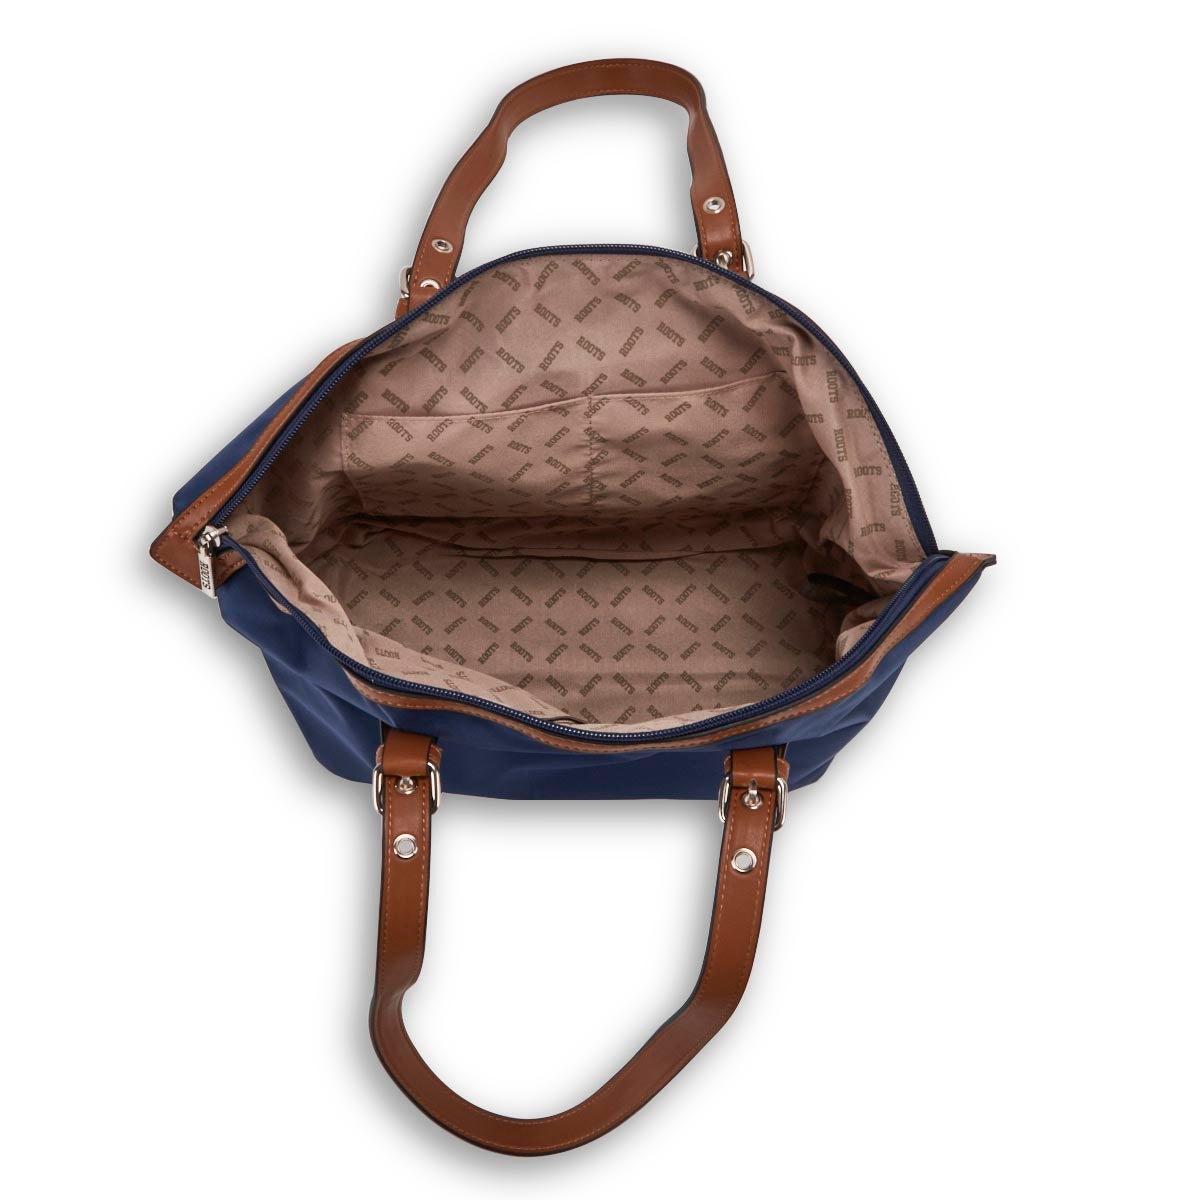 Lds Roots73 denim round top shoulder bag